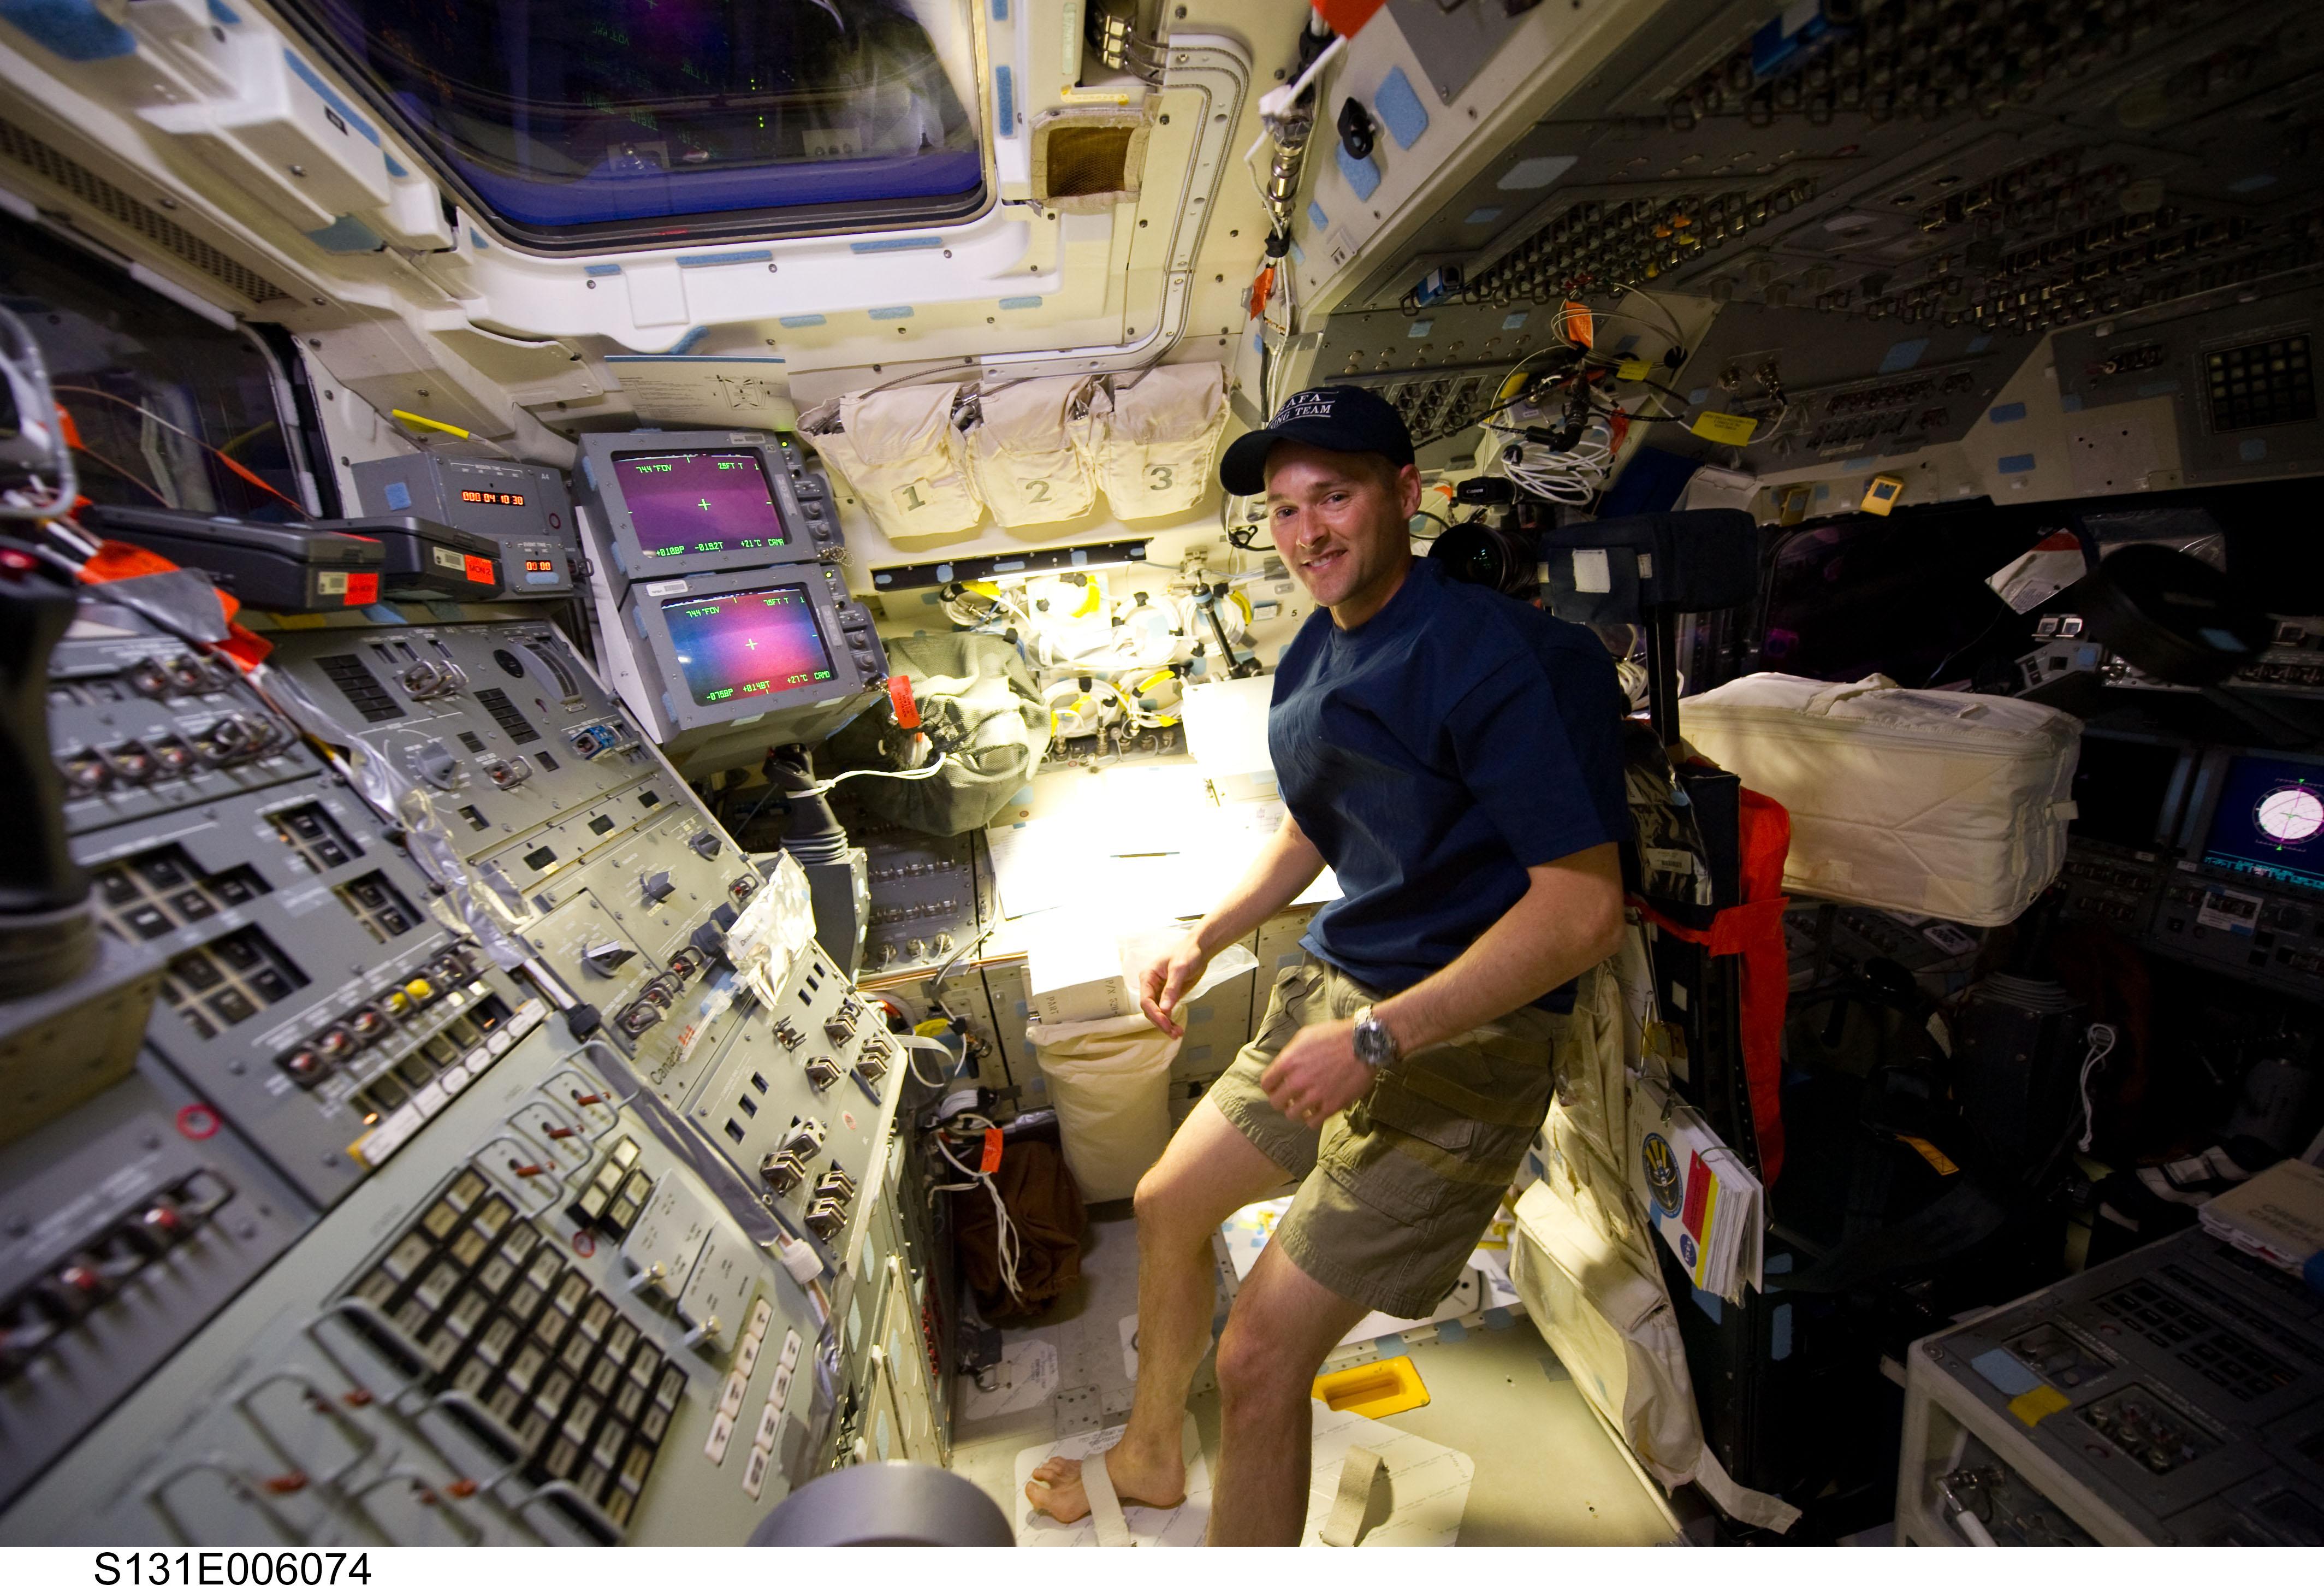 space shuttle interior tour - photo #20